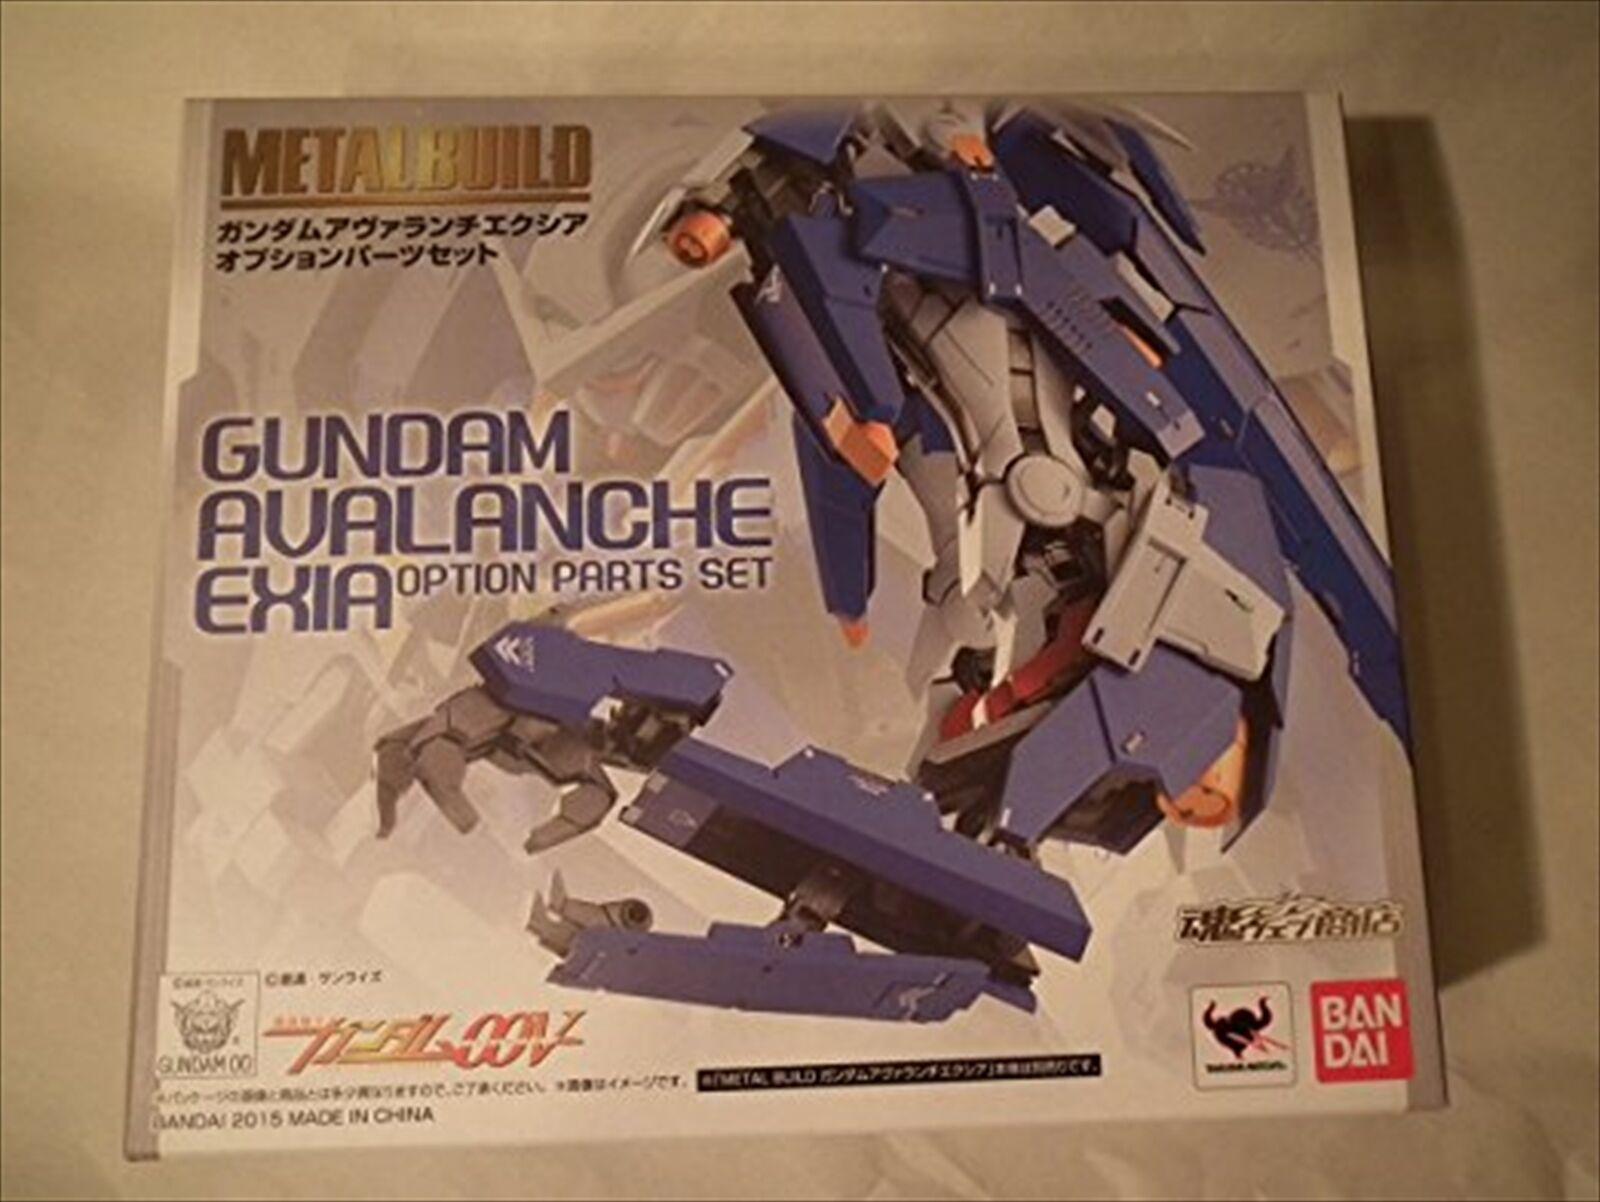 METAL BUILD Gundam Avalanche Exia option Parts Parts Parts Set F S NEW  JAPAN 4e6f2a